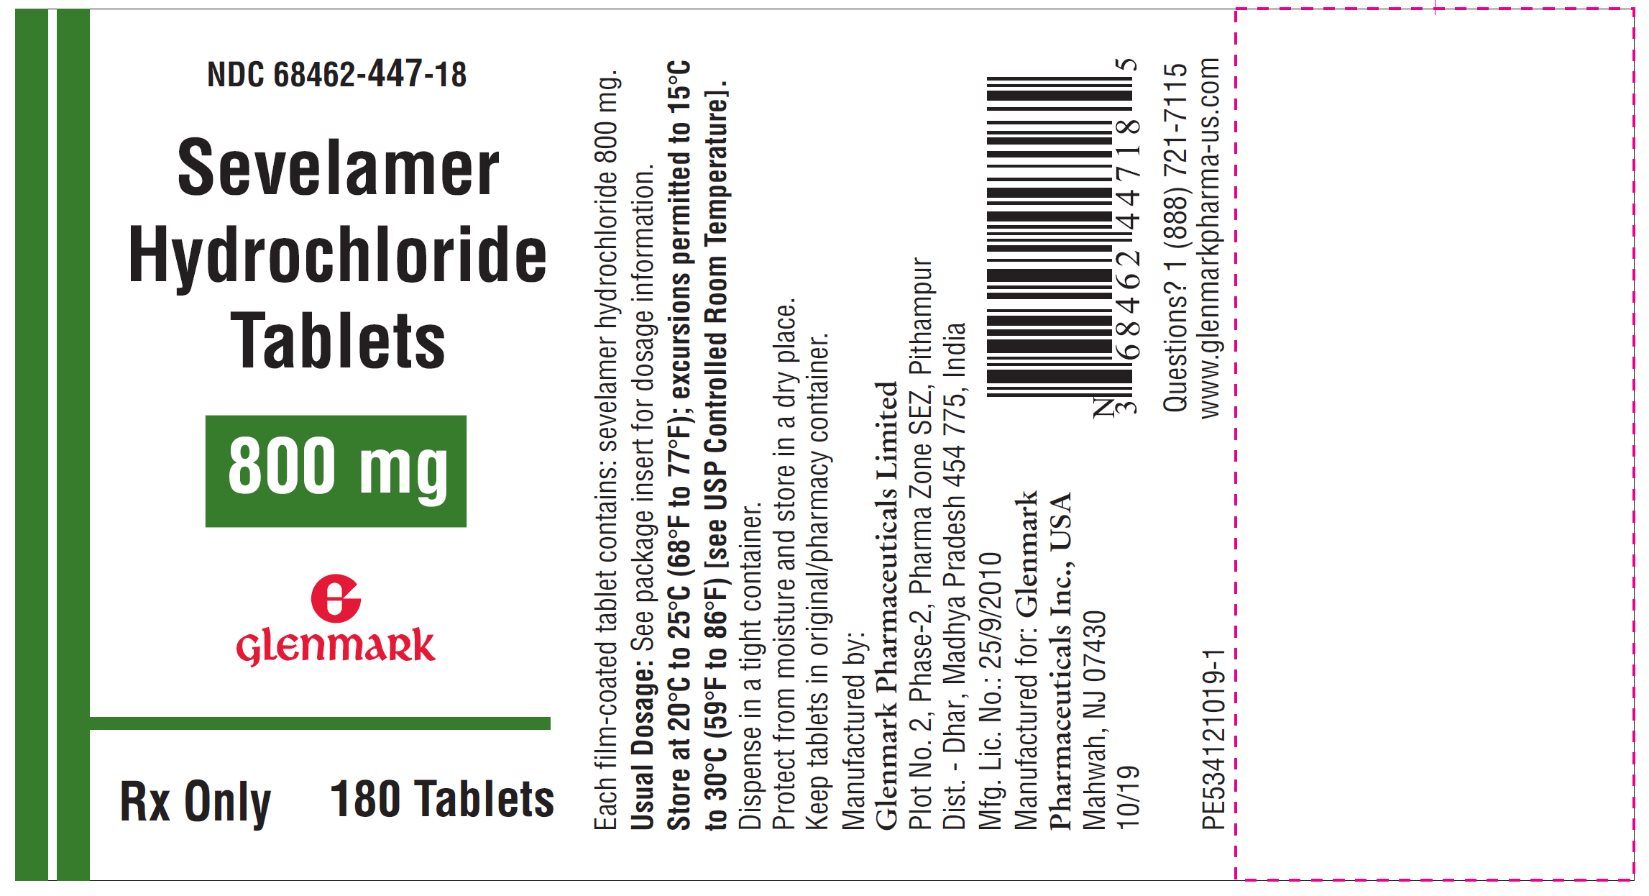 bottle-label-800-mg